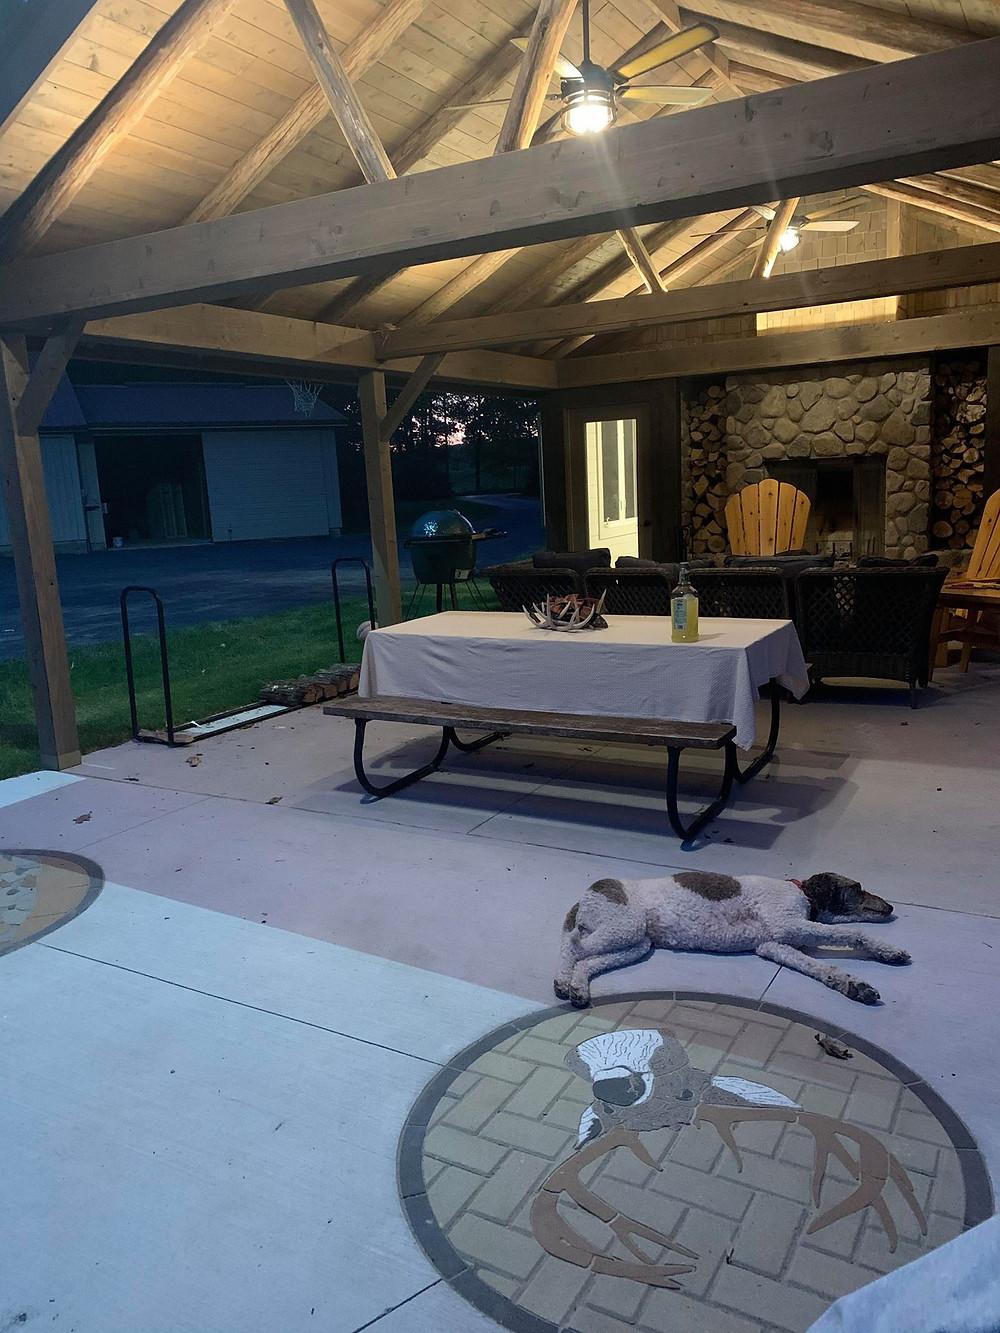 Paverart, custom inlay, paverart buck, landscape design, patio ideas